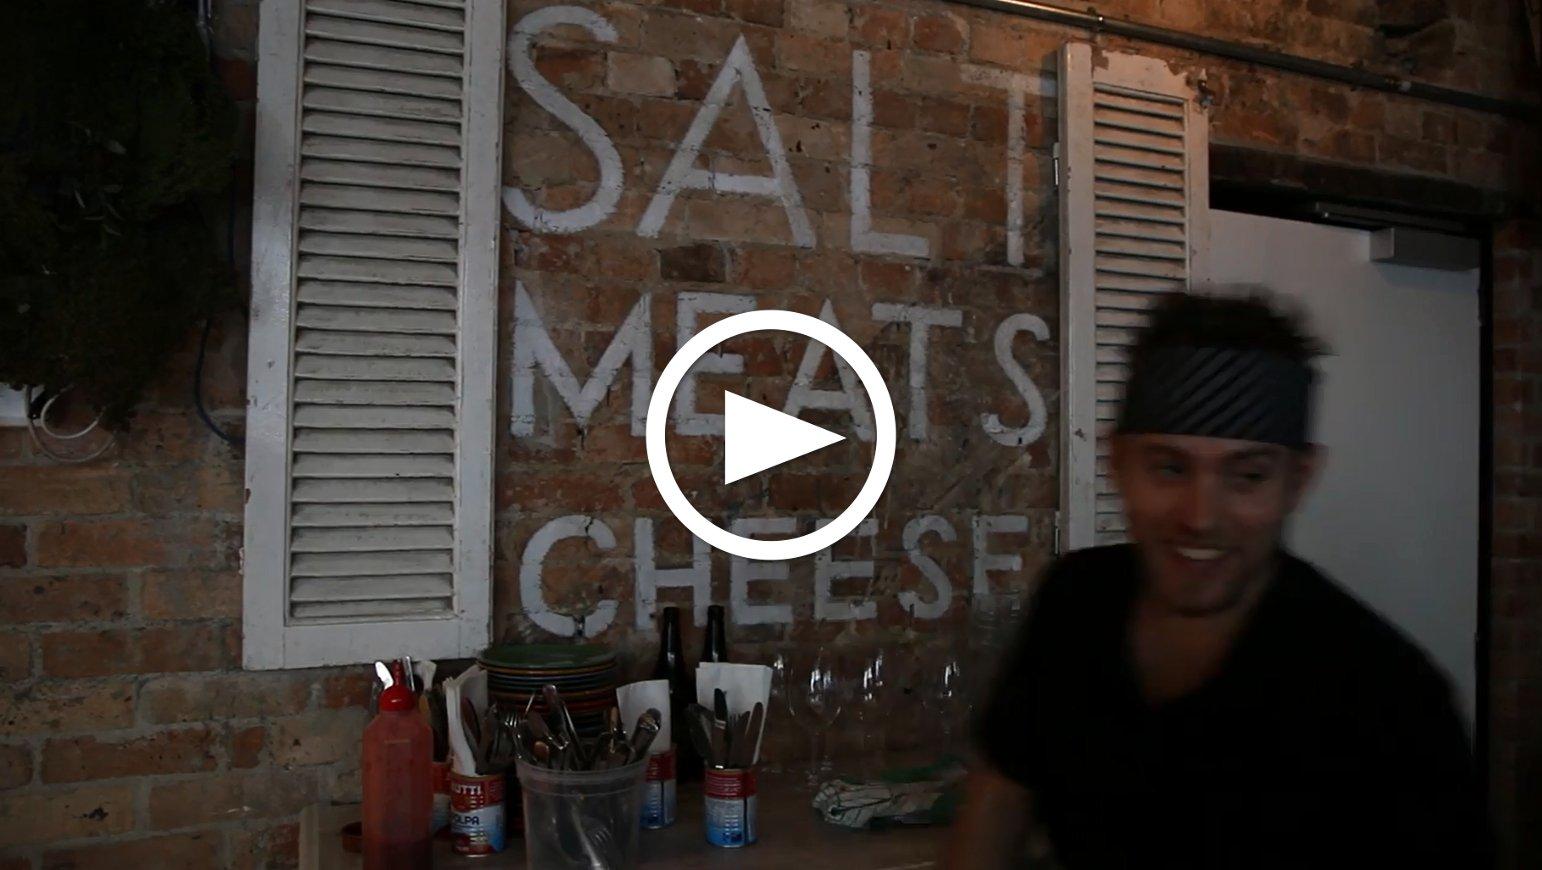 Salt Meats Cheese